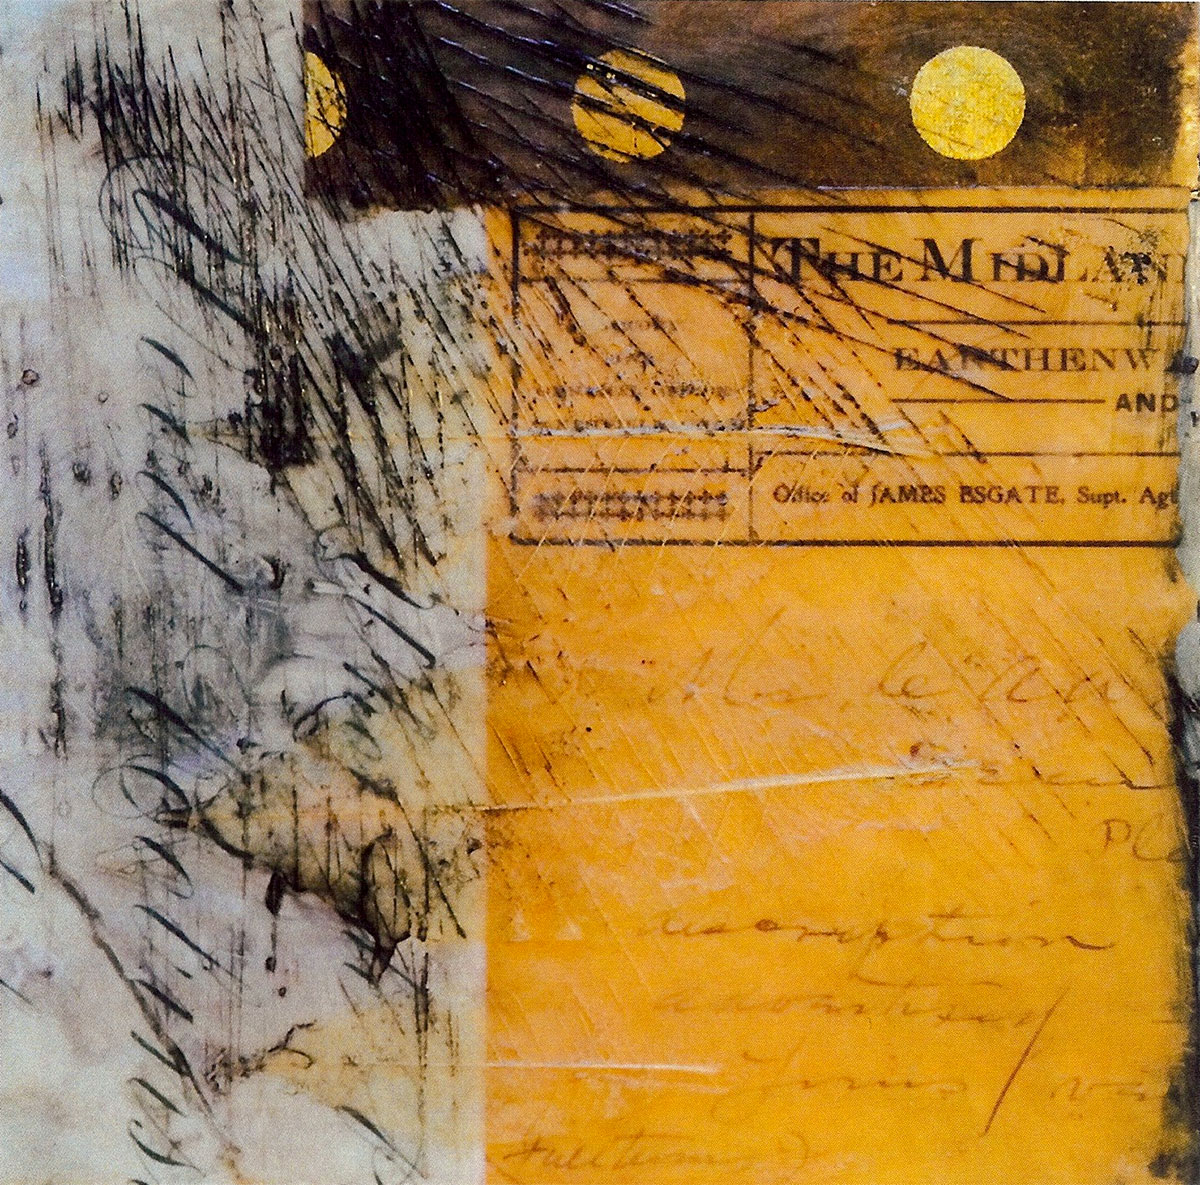 Wood-Robinson, encaustic by Berri Kramer